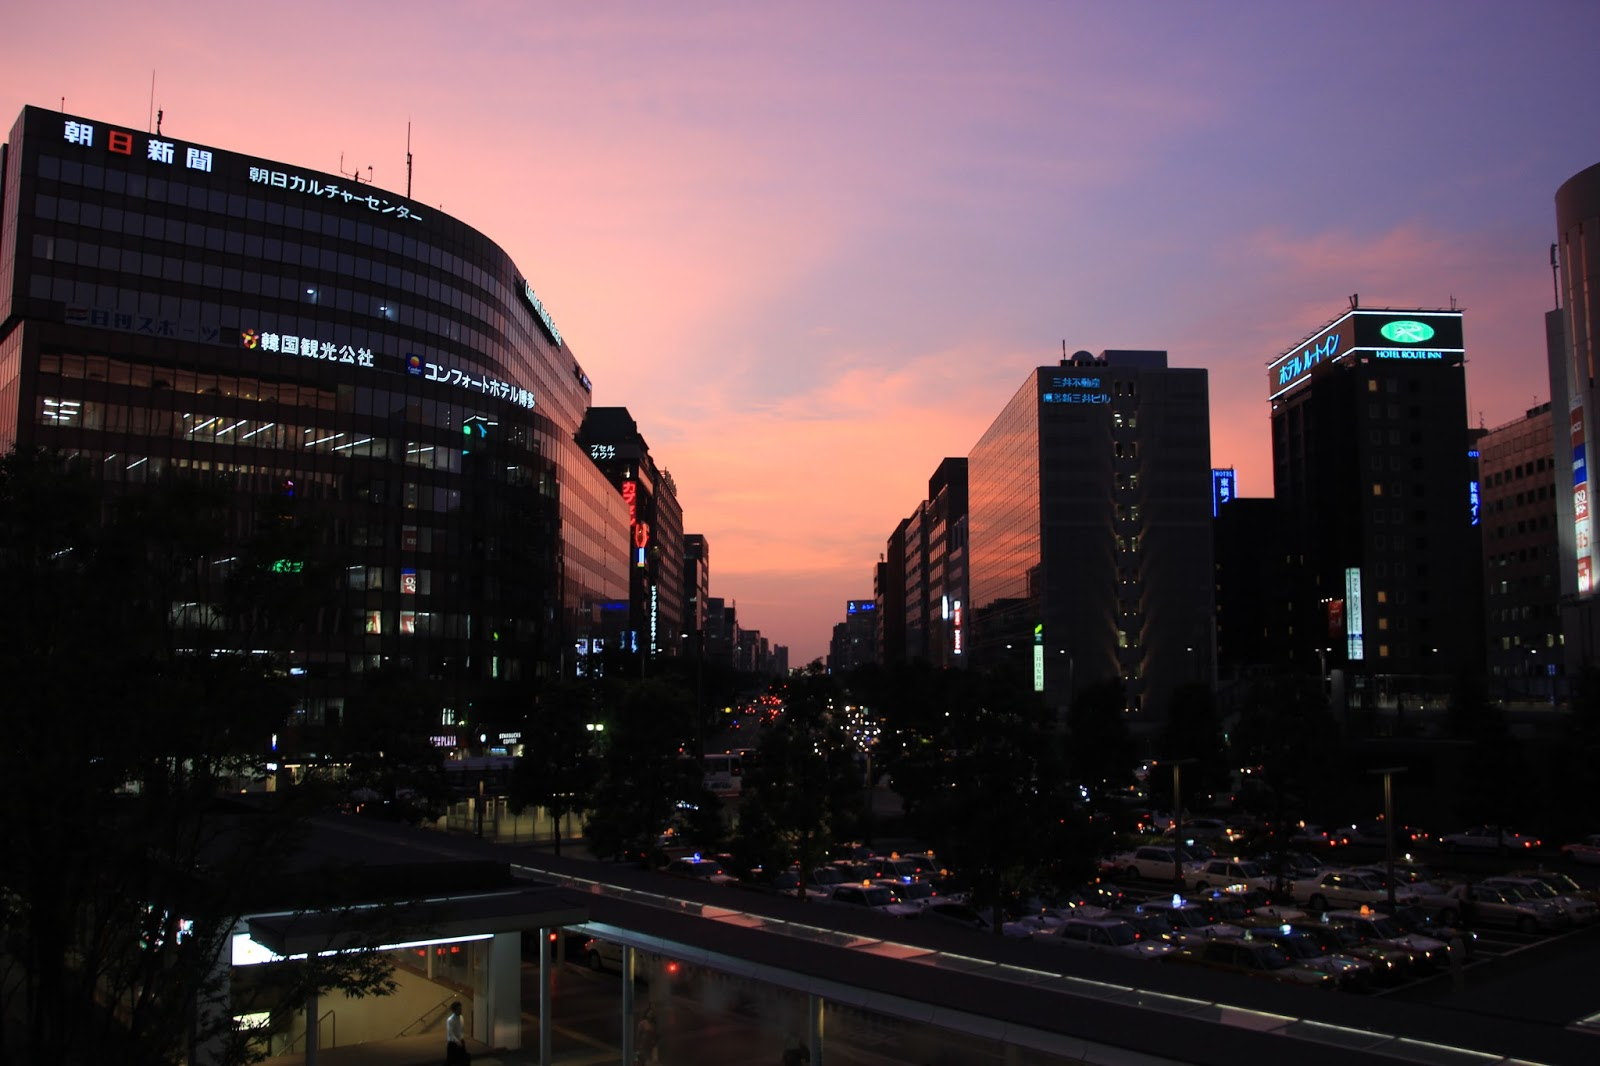 Mars 冒險世界: 福岡市旅遊景點